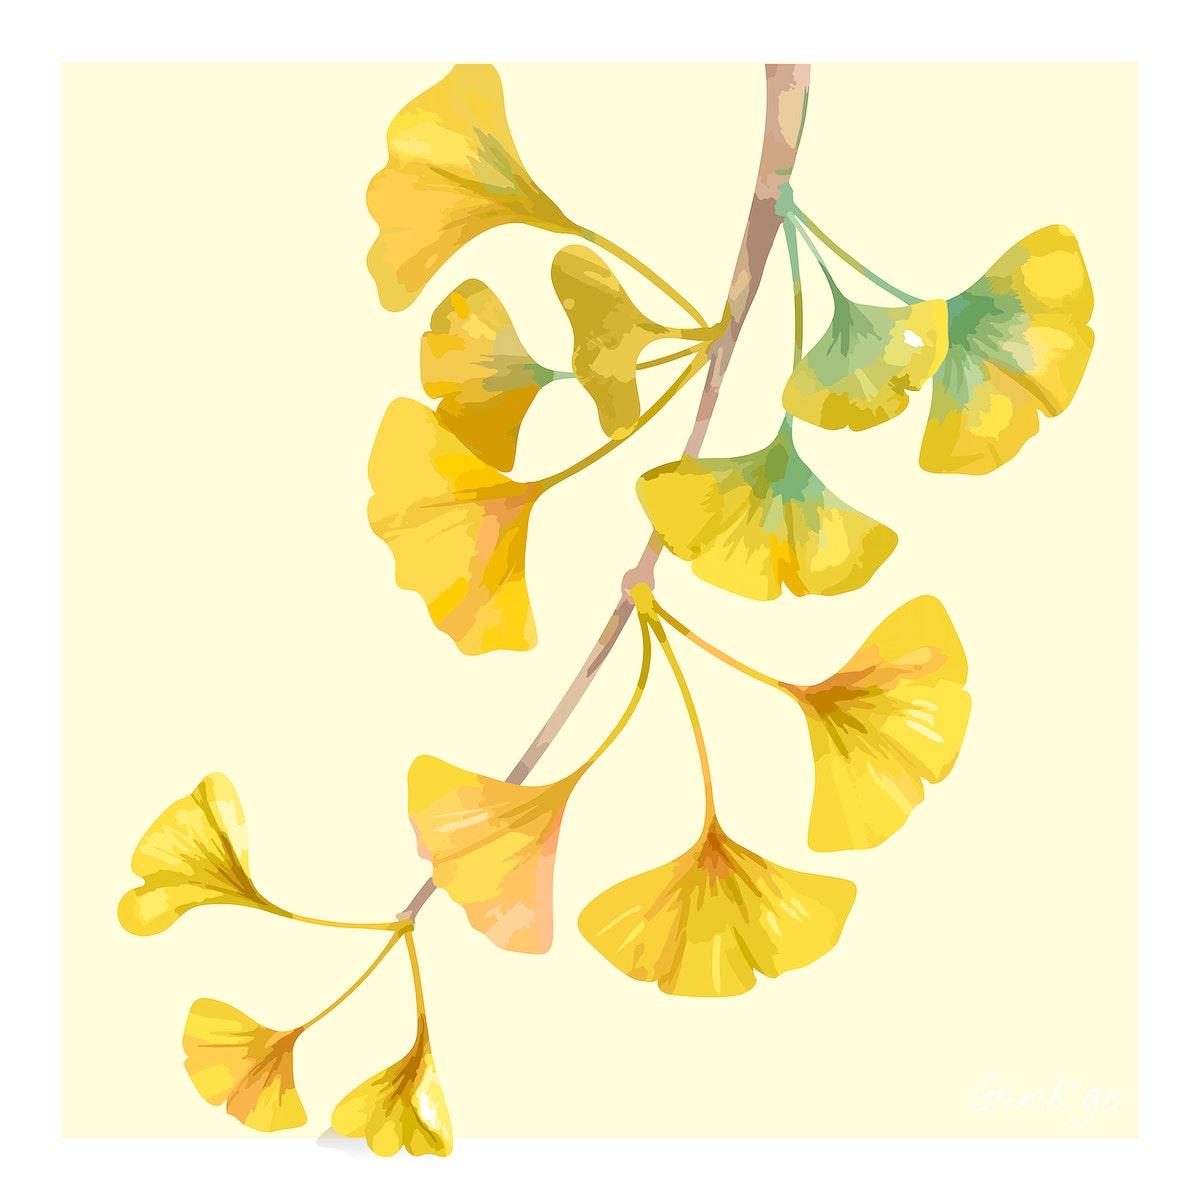 Hand drawn ginkgo flower illustration